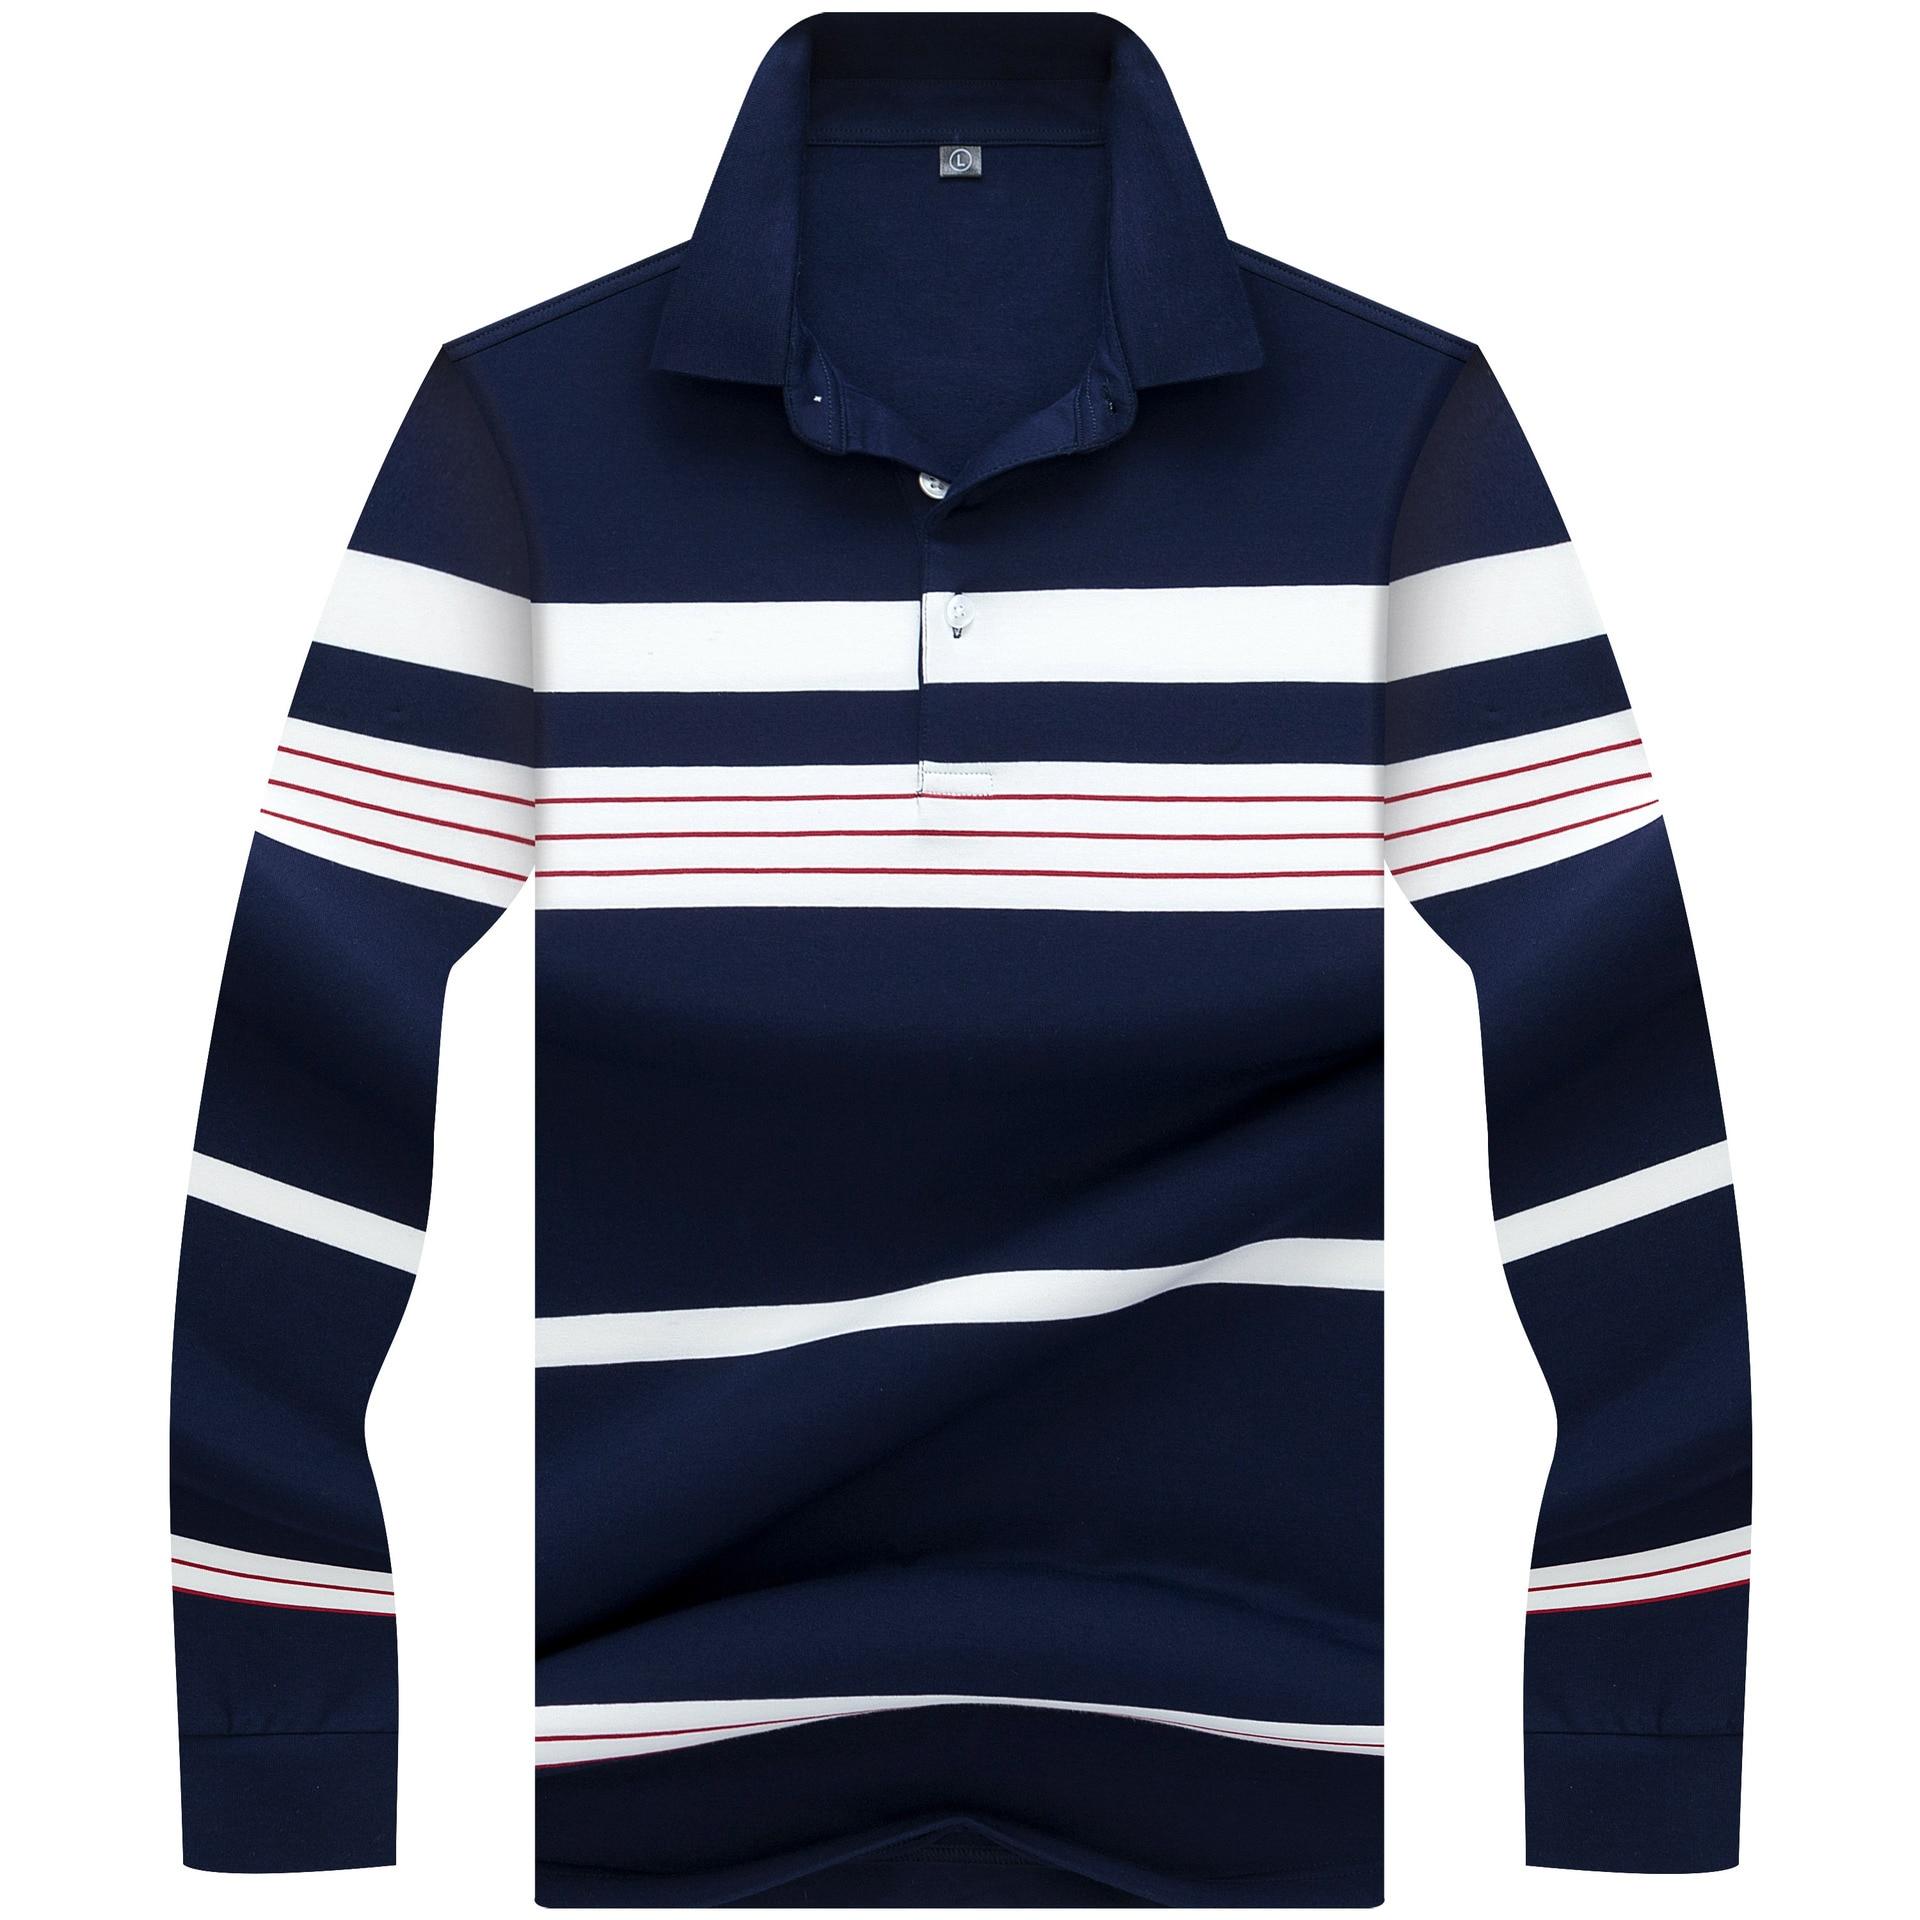 2018 Top Kwaliteit Winter Lange mouw Polo Shirt Gestreepte Business merk polo Shirts Casual paard poloshirts